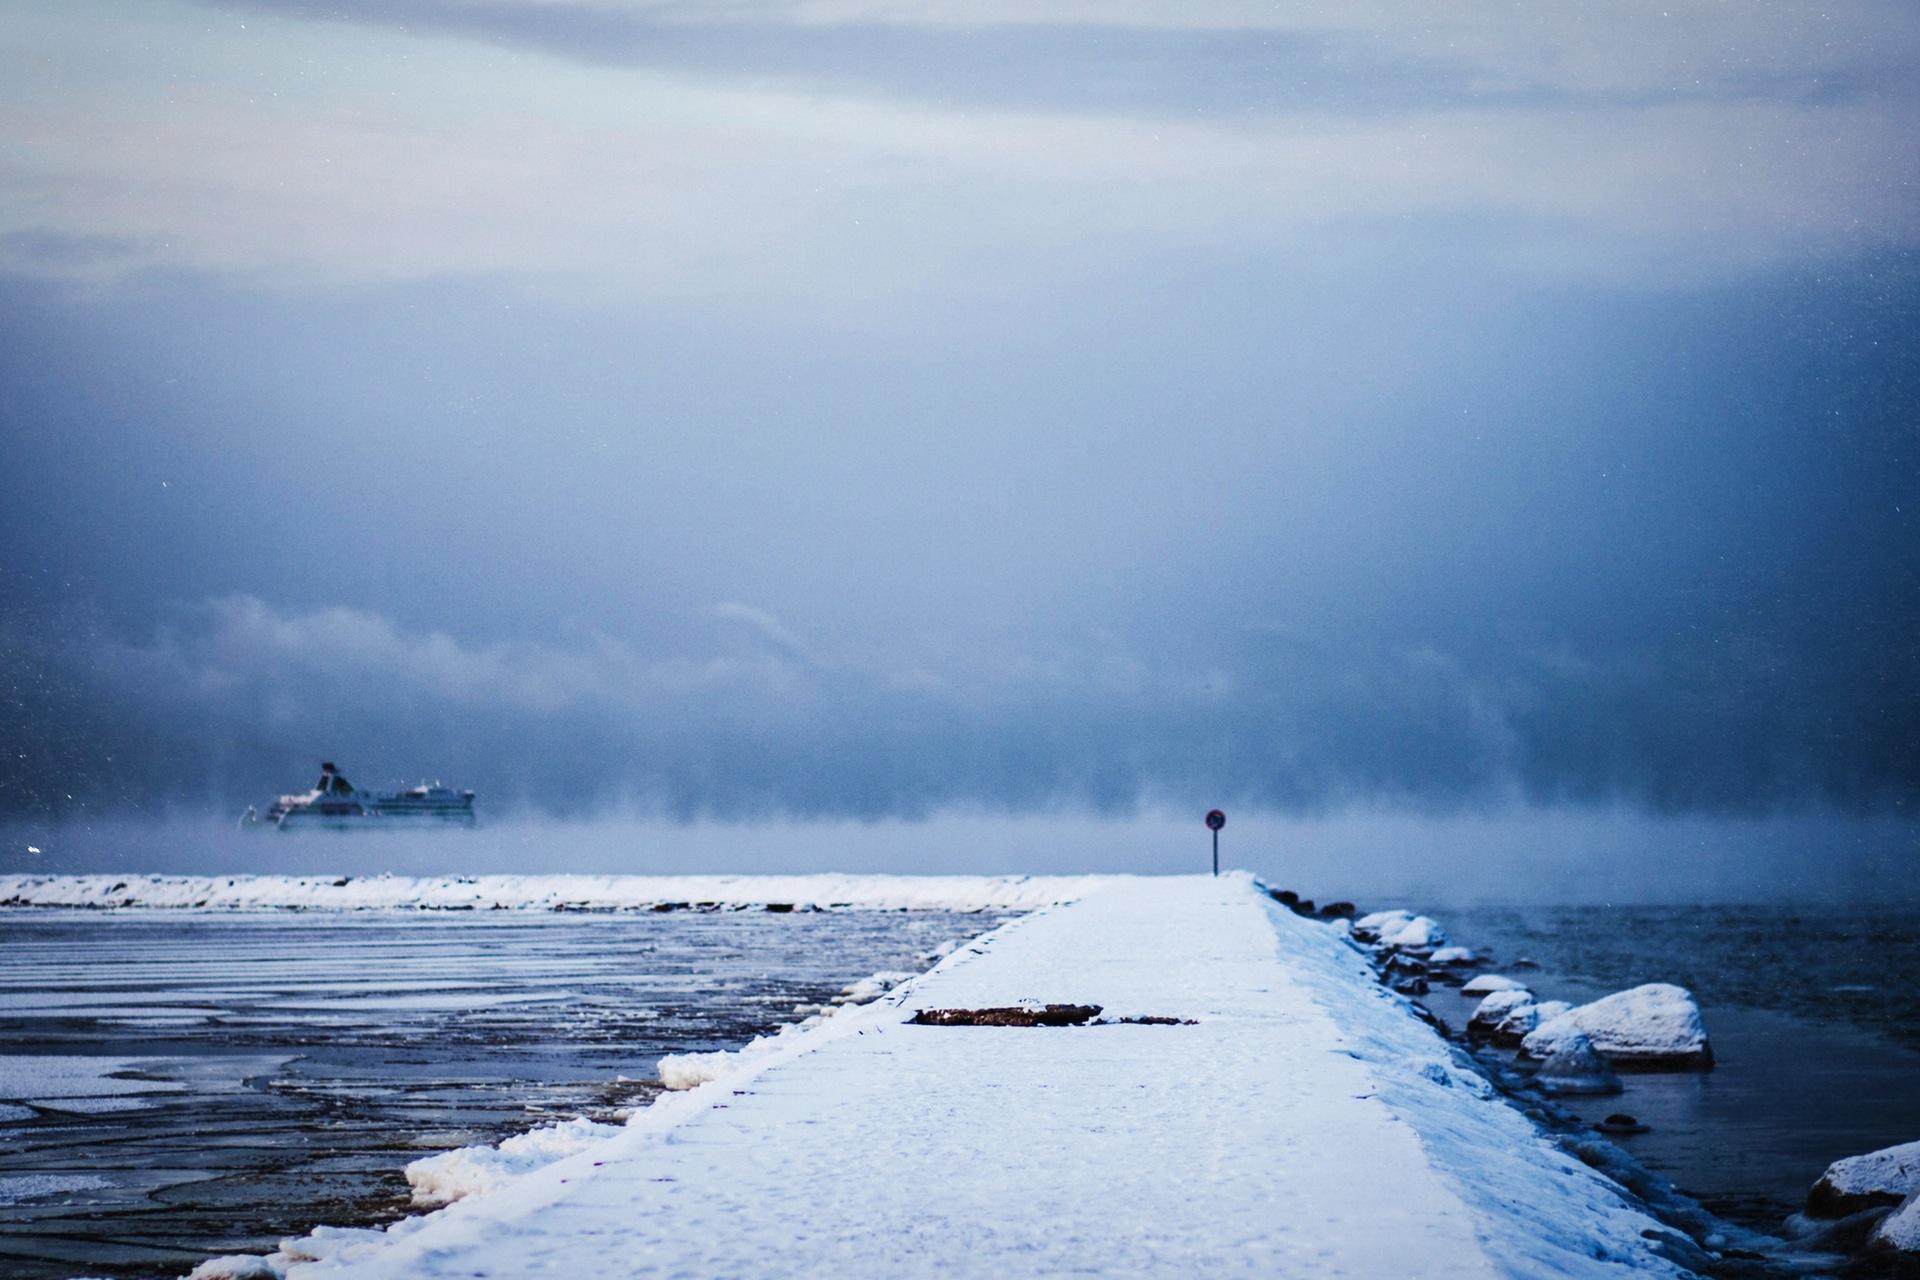 neige, glace, Mer, Océan, Hiver, bateau - Fonds d'écran HD - Professor-falken.com